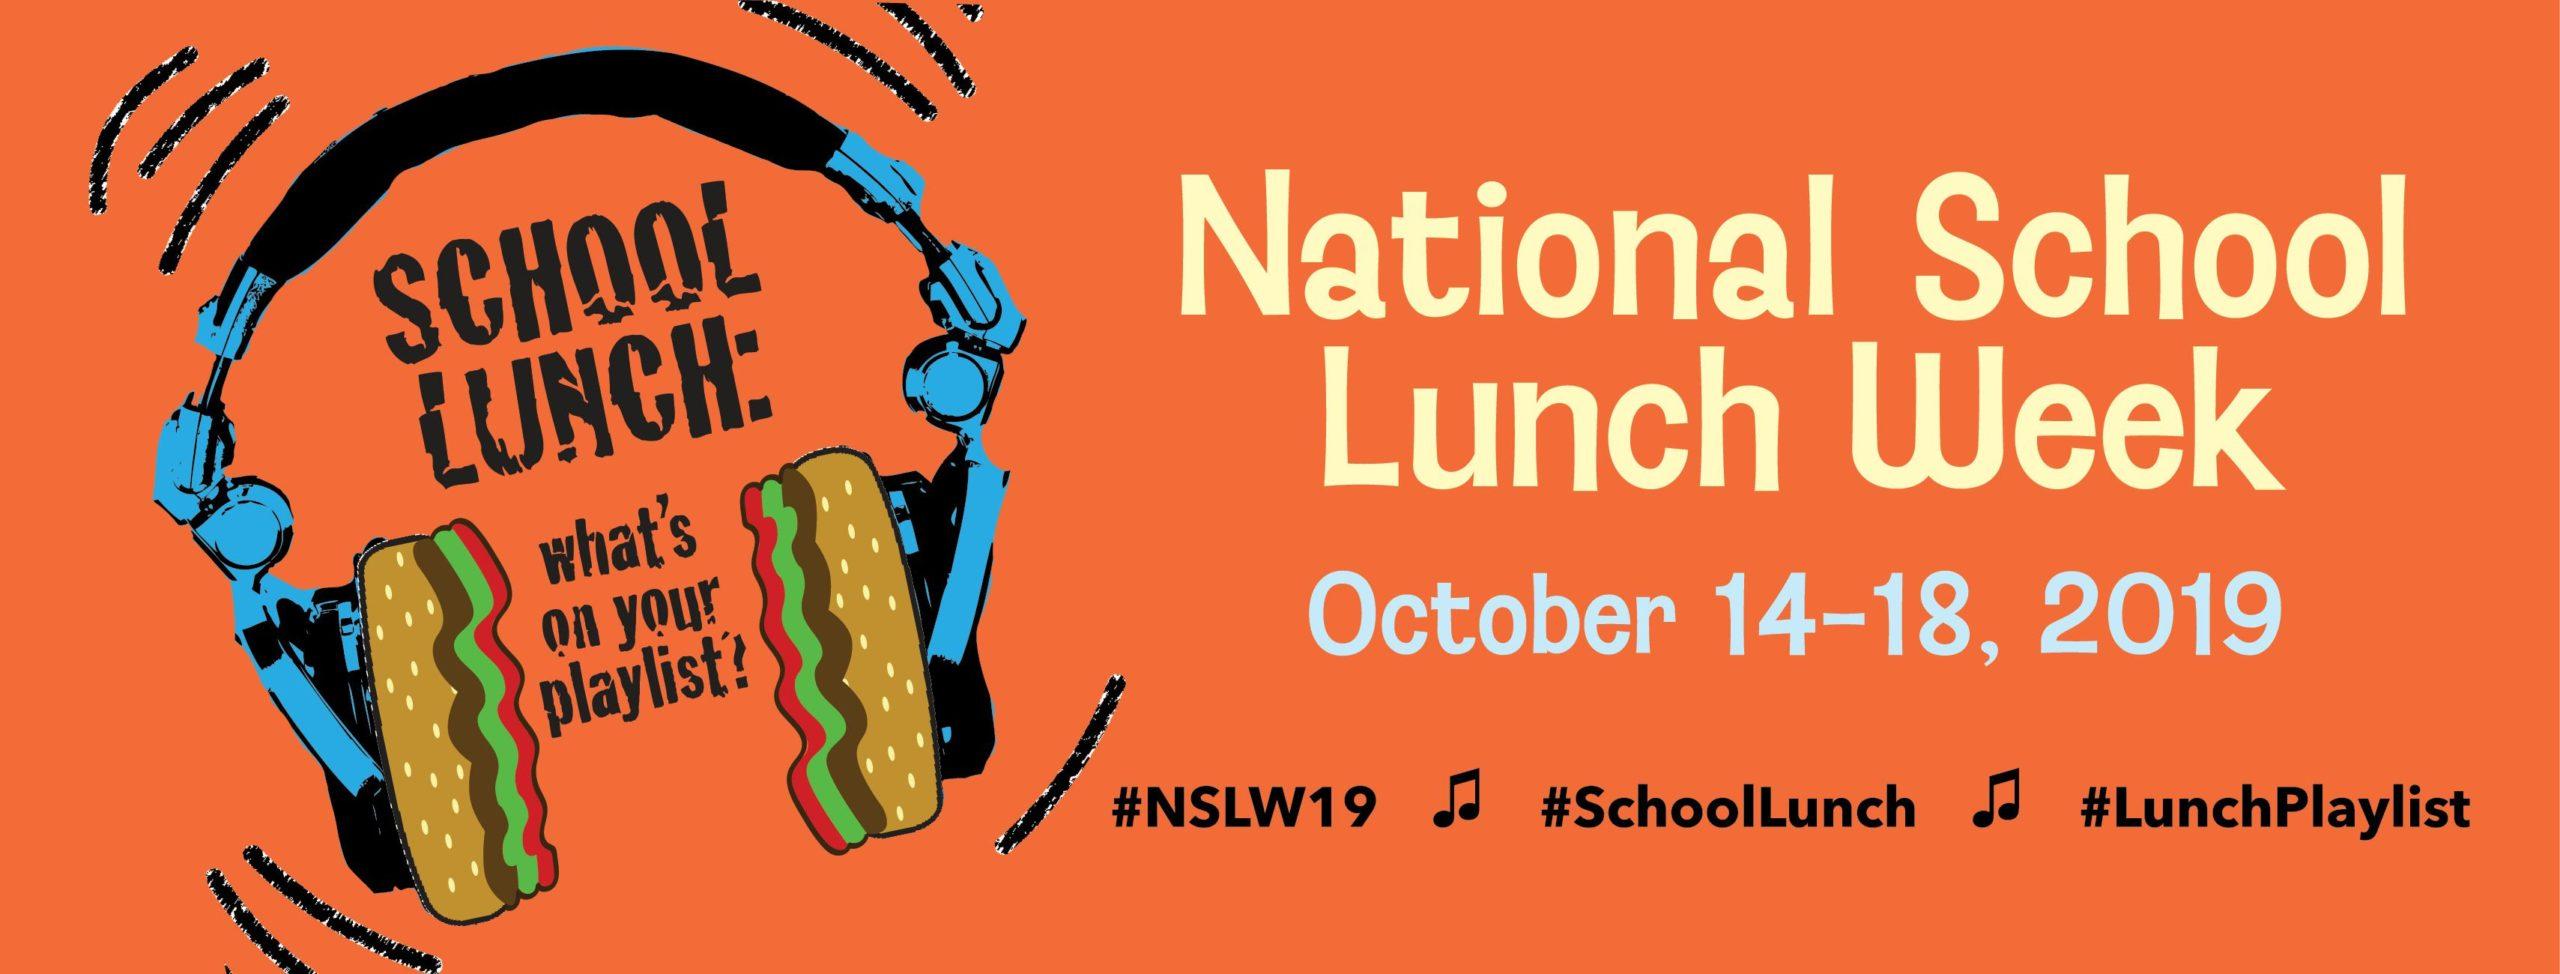 National School Lunch Week - October 14-18, 2019 - School Lunch: what's on your playlist? - #NSLW19, #SchoolLunch, #LunchPlaylist